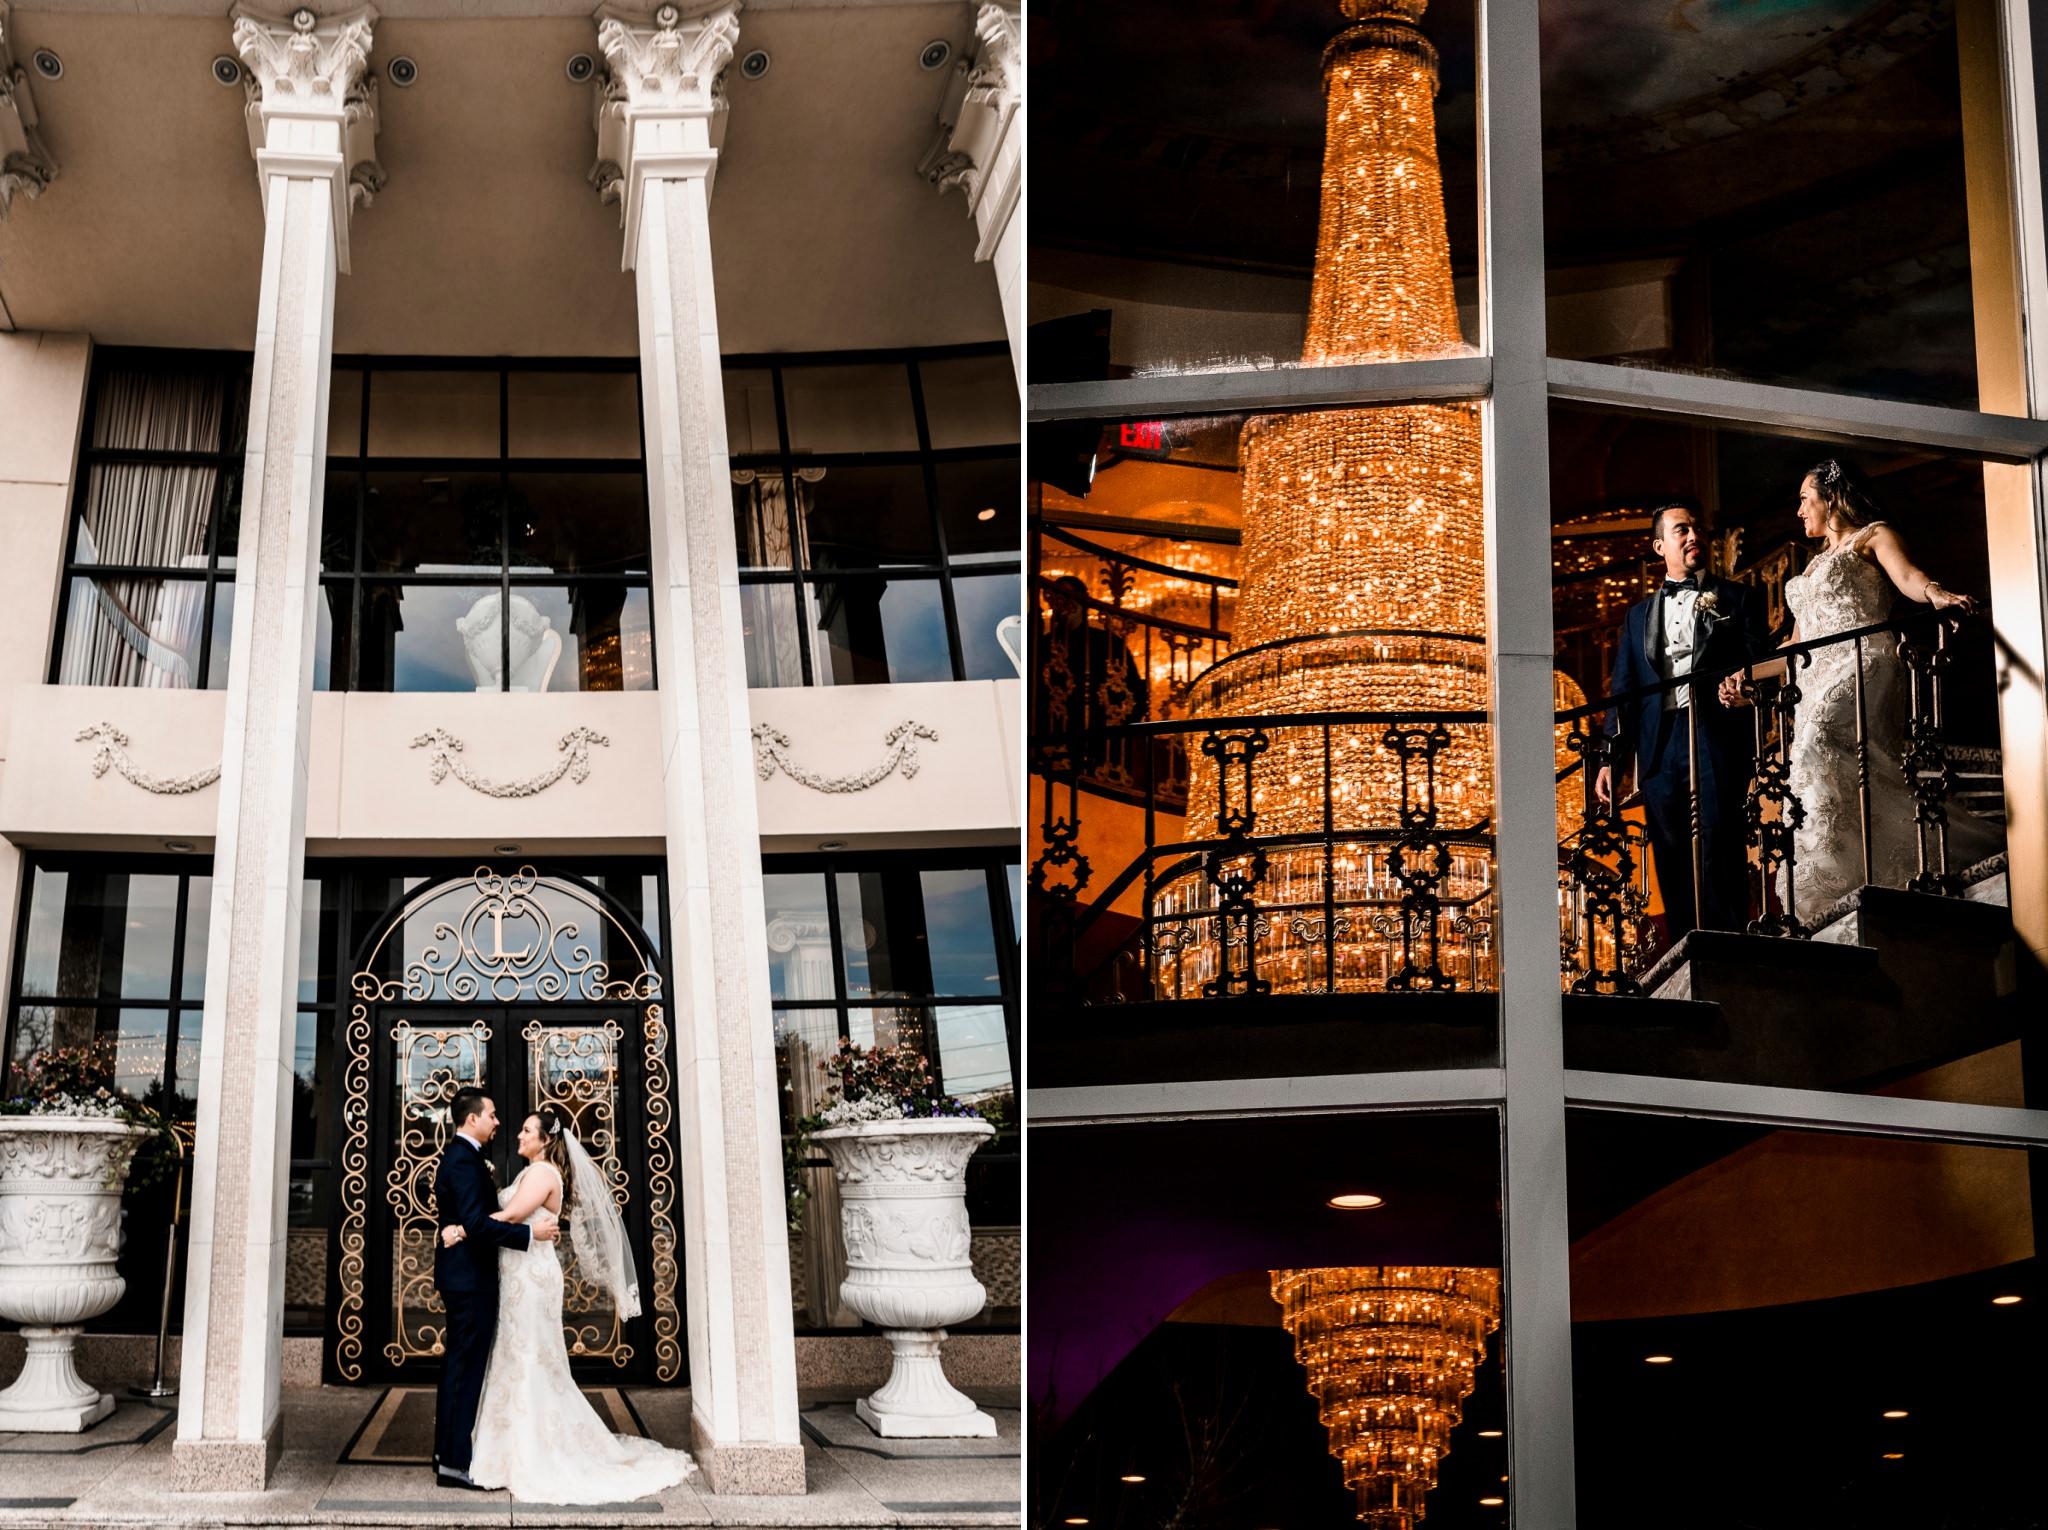 Sanchez-Leonards-Palazzo-New-York-Wedding-Photographer-57.JPG